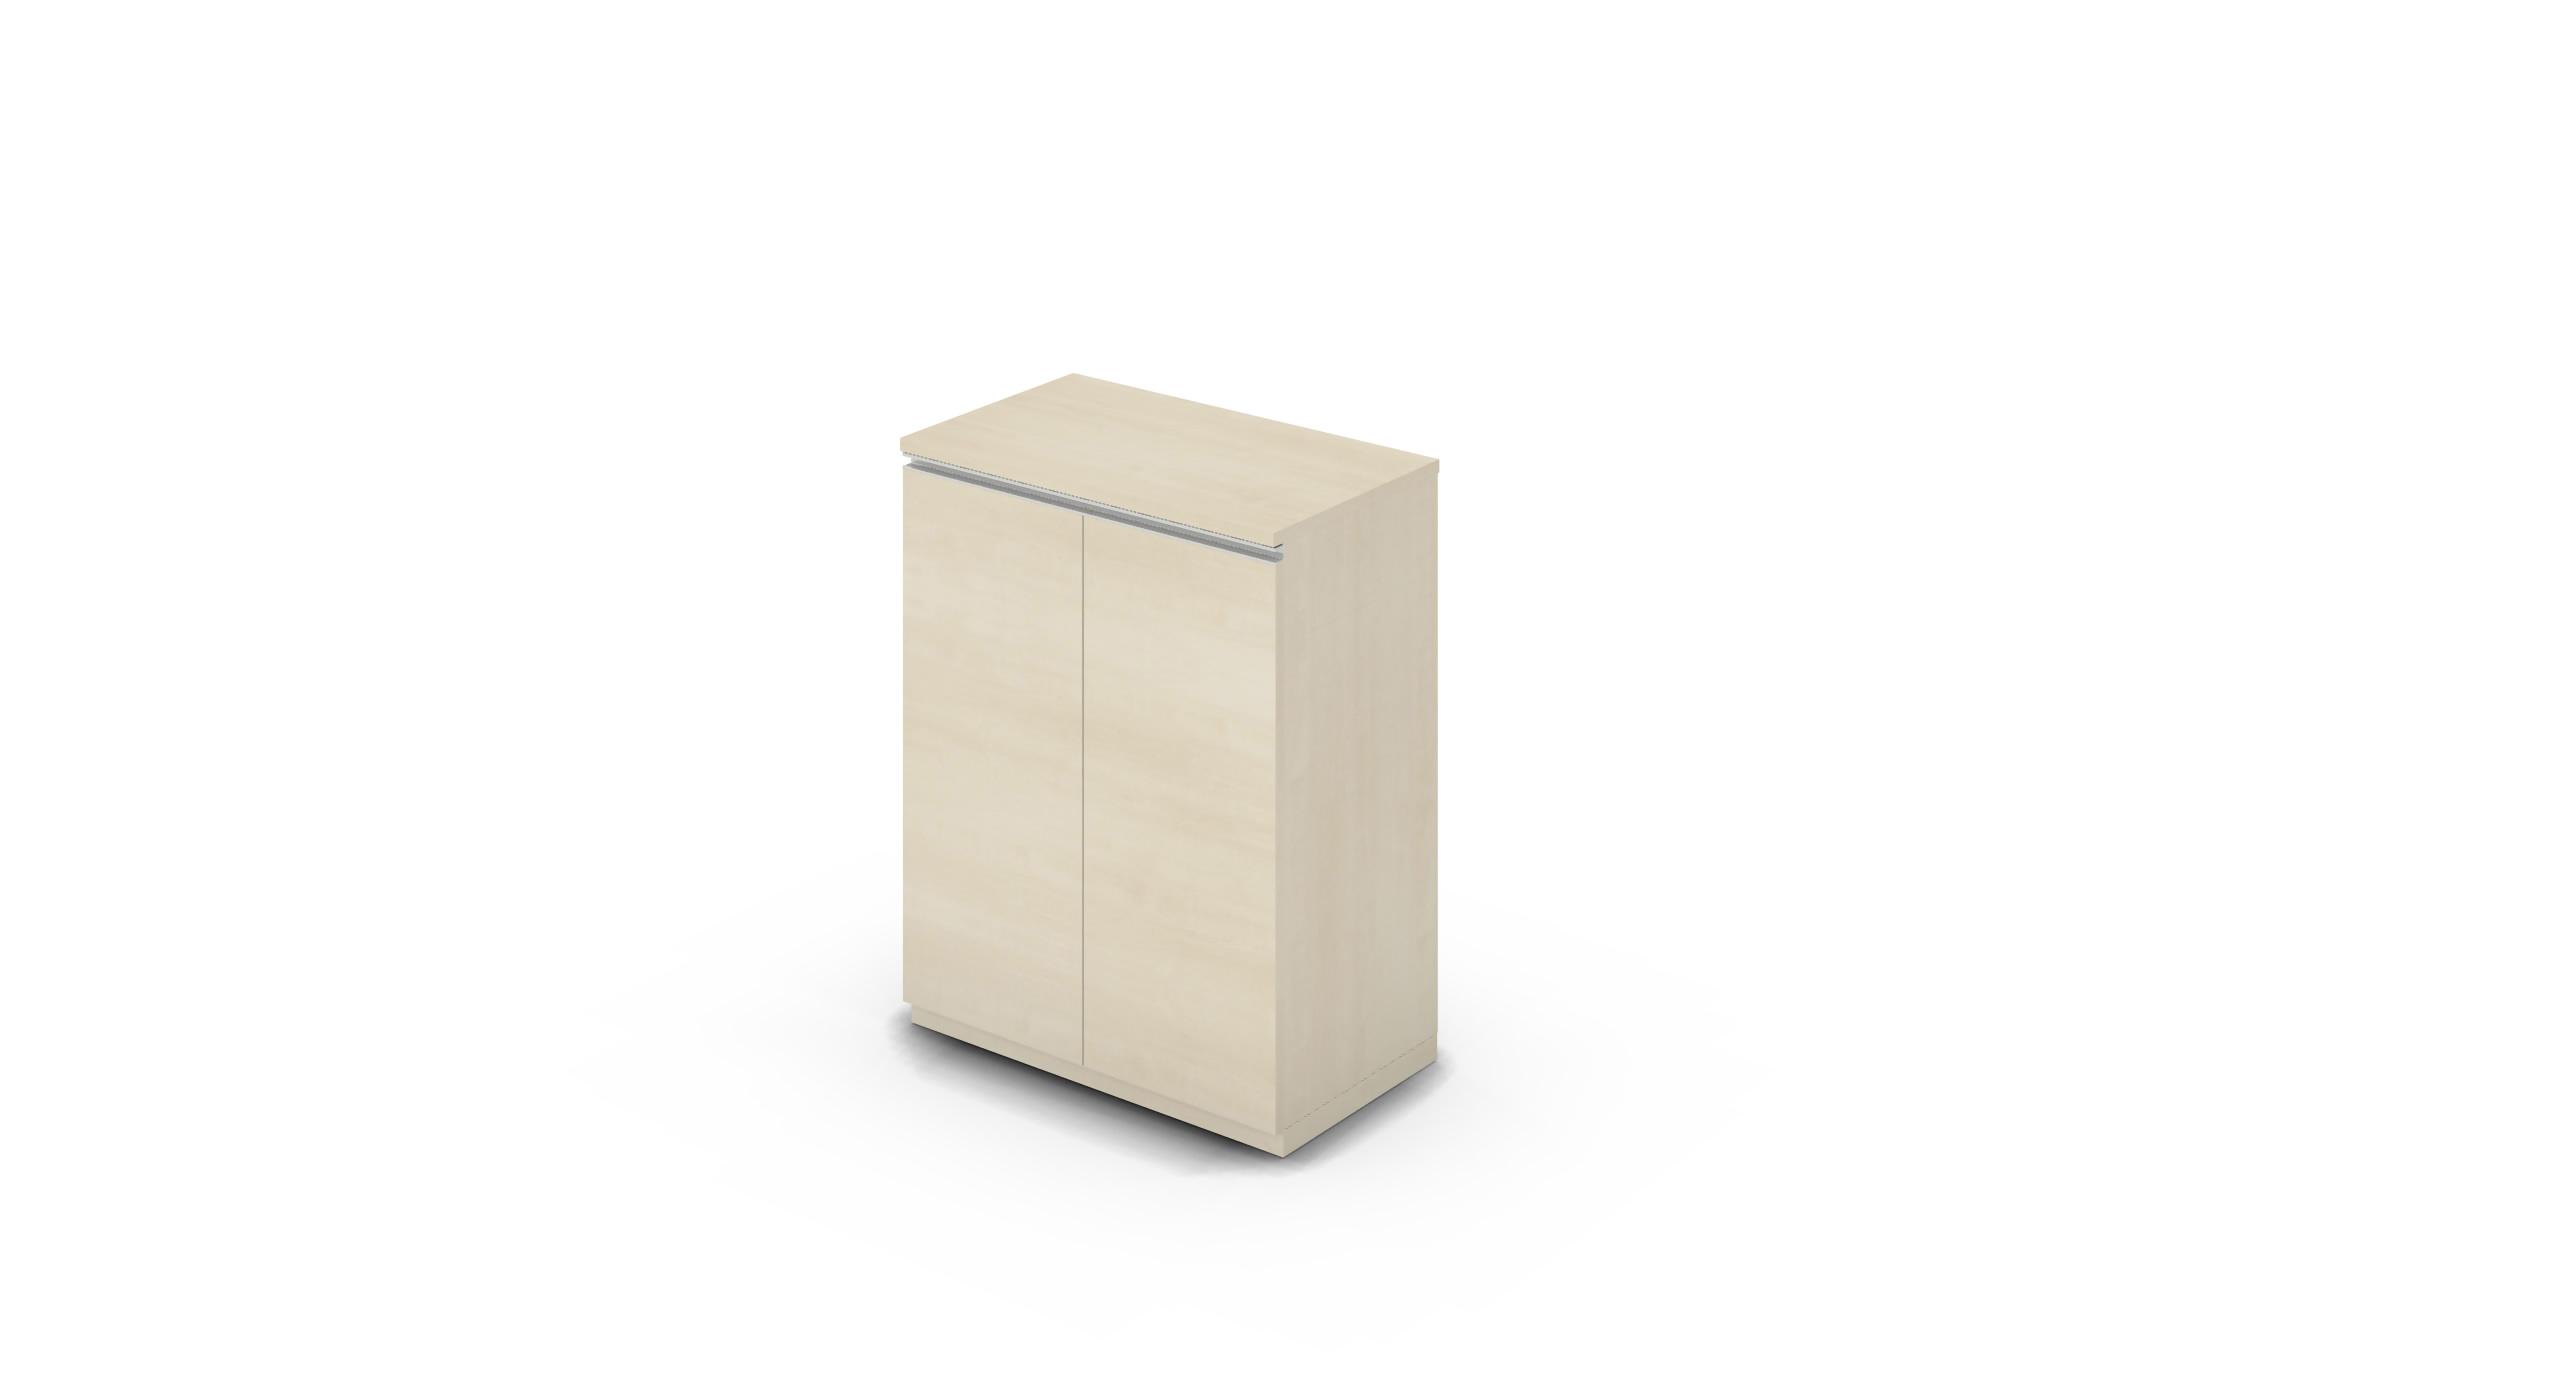 Cabinet_800x450x1125_HD_Maple_Rail_NoCylinder